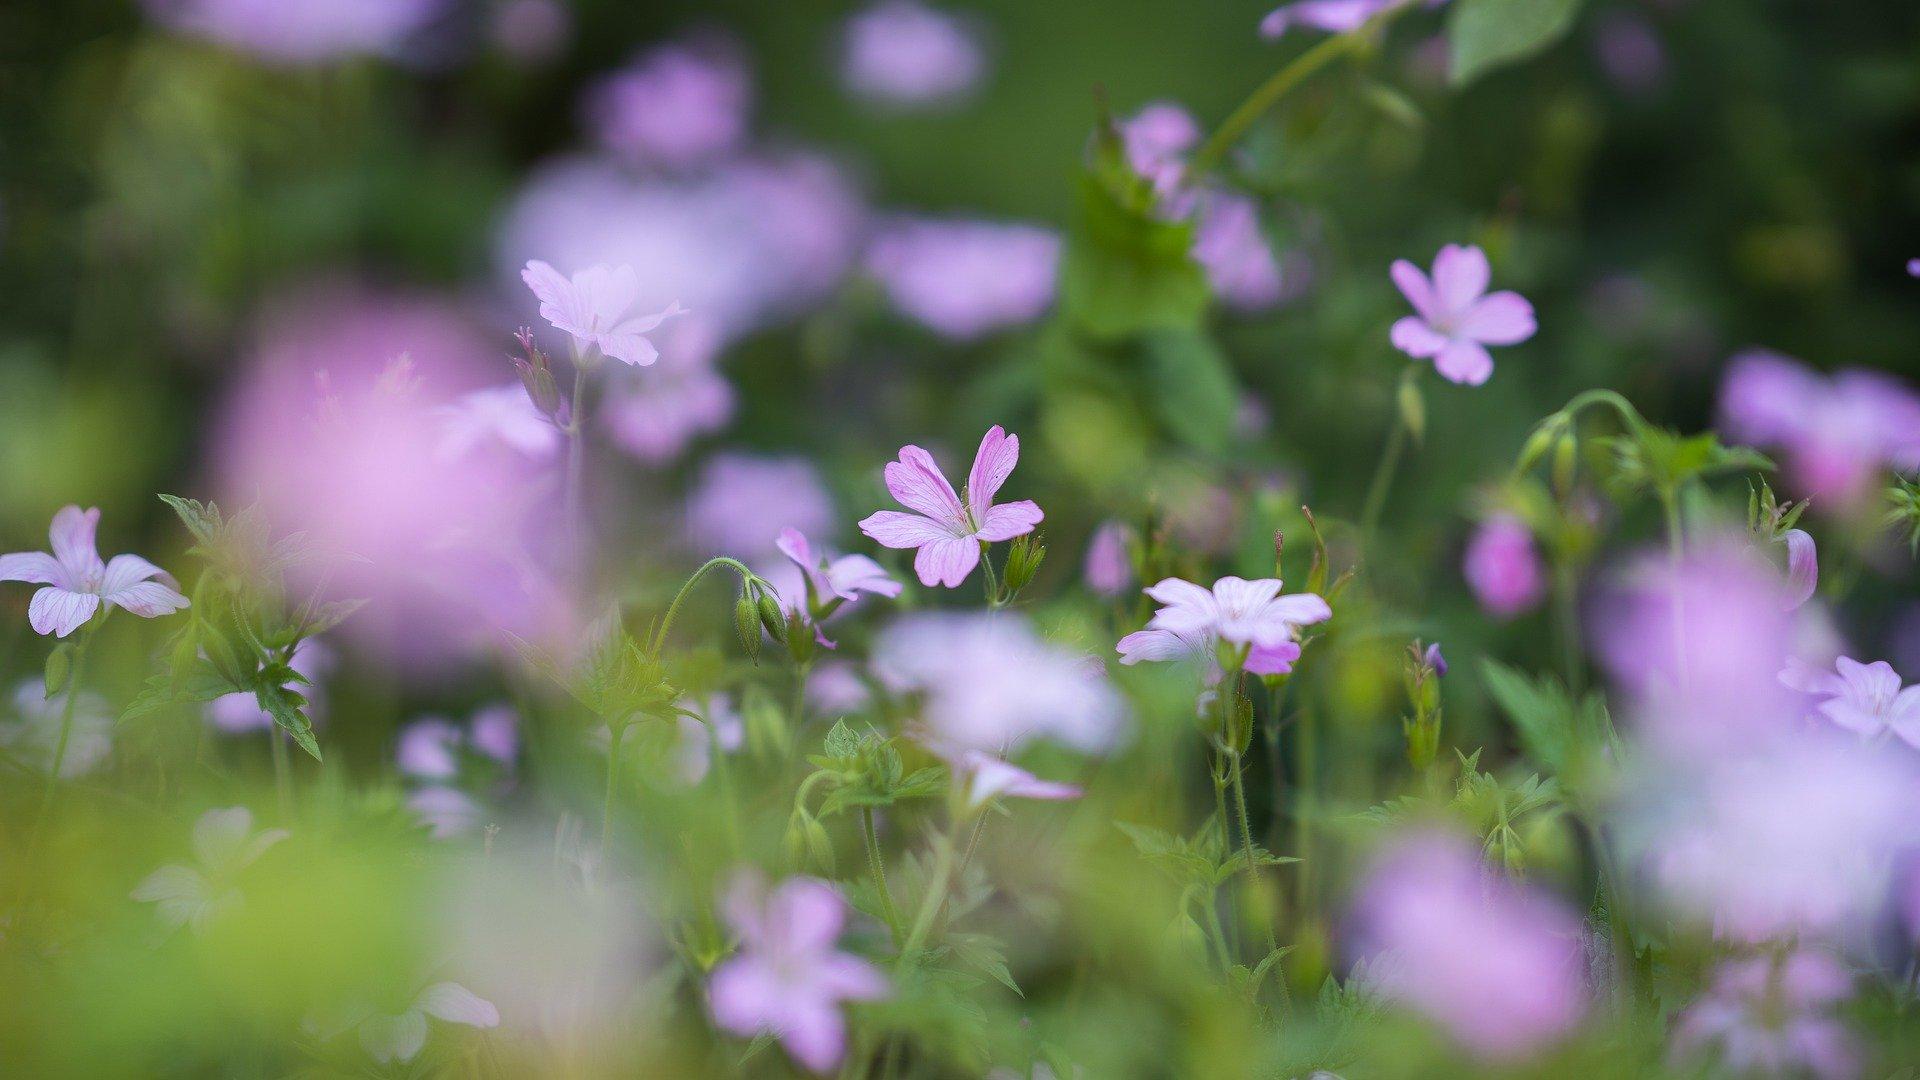 flowers 5357740 1920